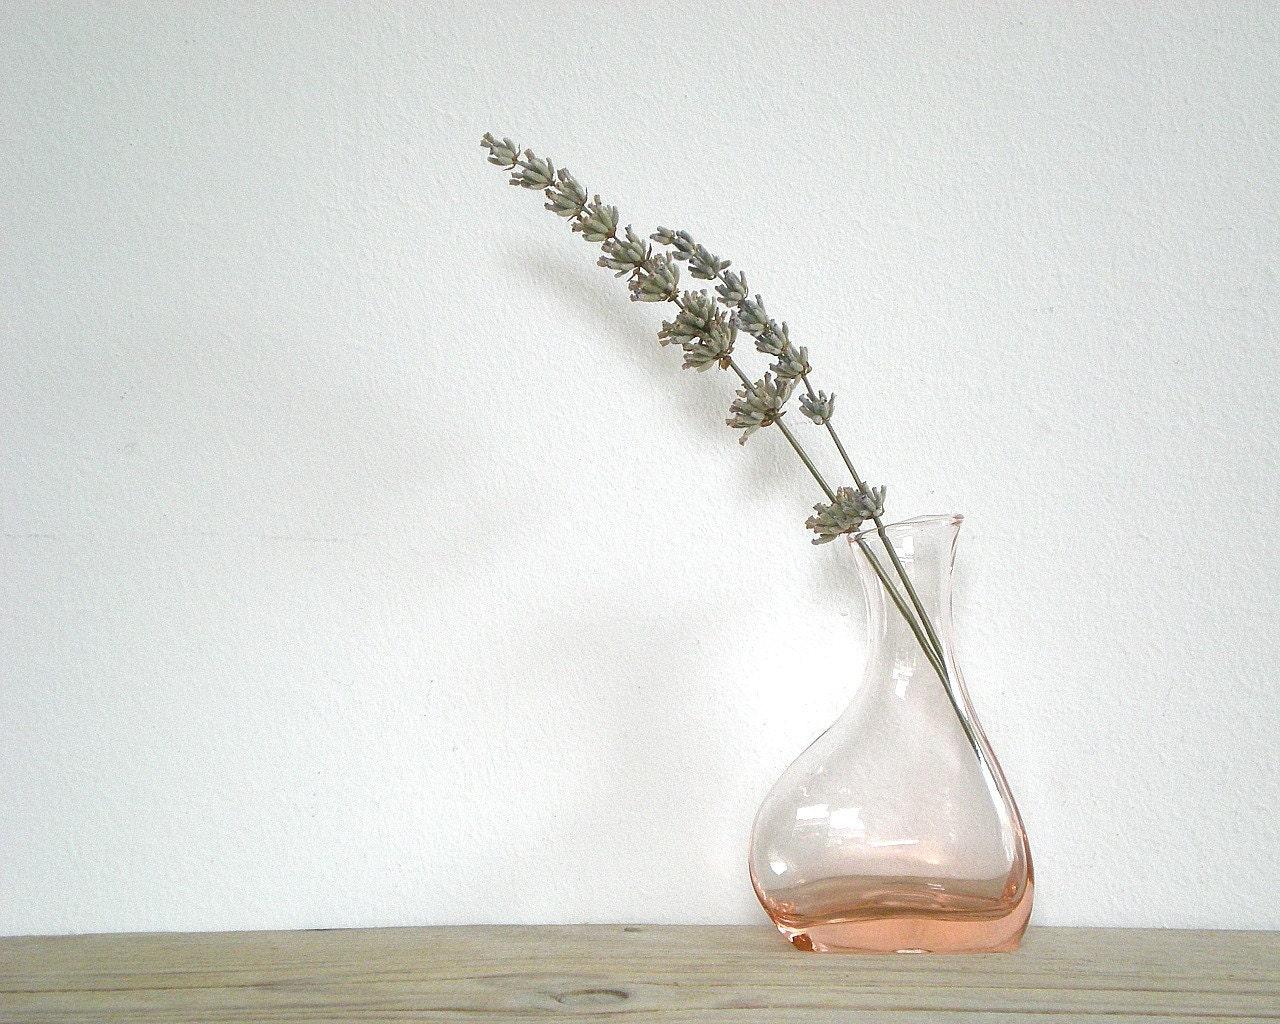 VINTAGE glass vase, pink vase, glassware, flower vase, pink glass - viadeinavigli